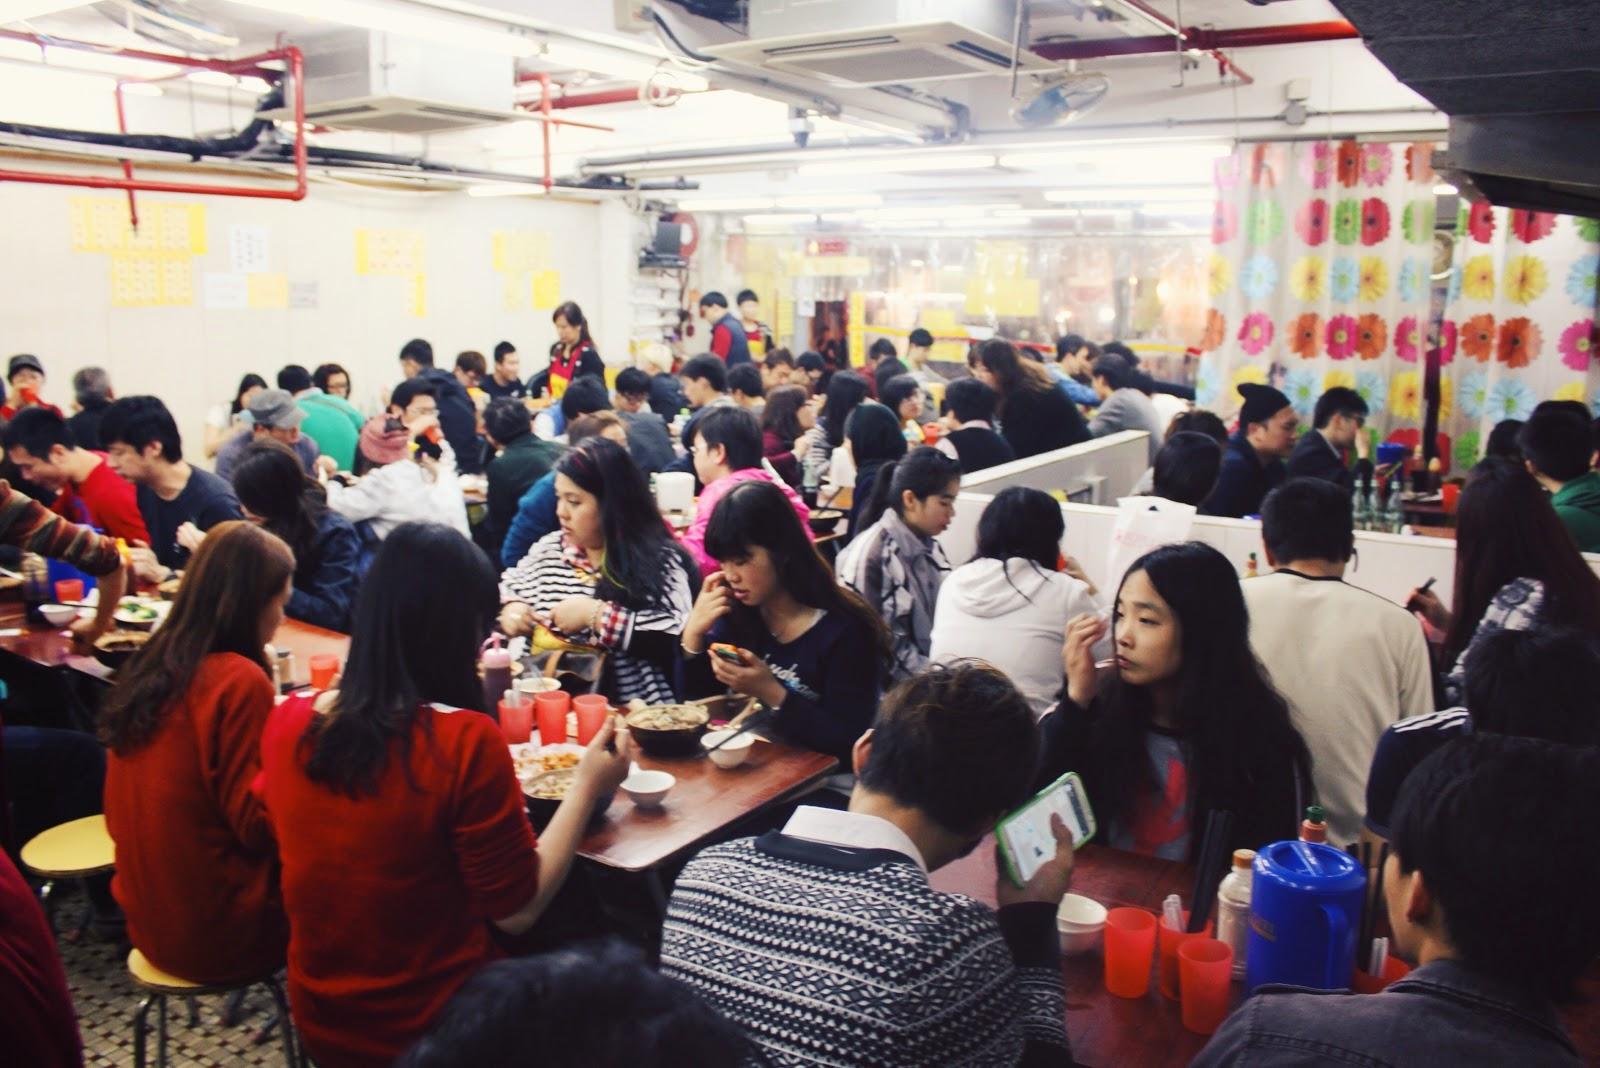 四季煲仔飯 Four Season Claypot Rice @ 香港油麻地廟街 Arthur Street, Yau Ma Tei, Hong Kong